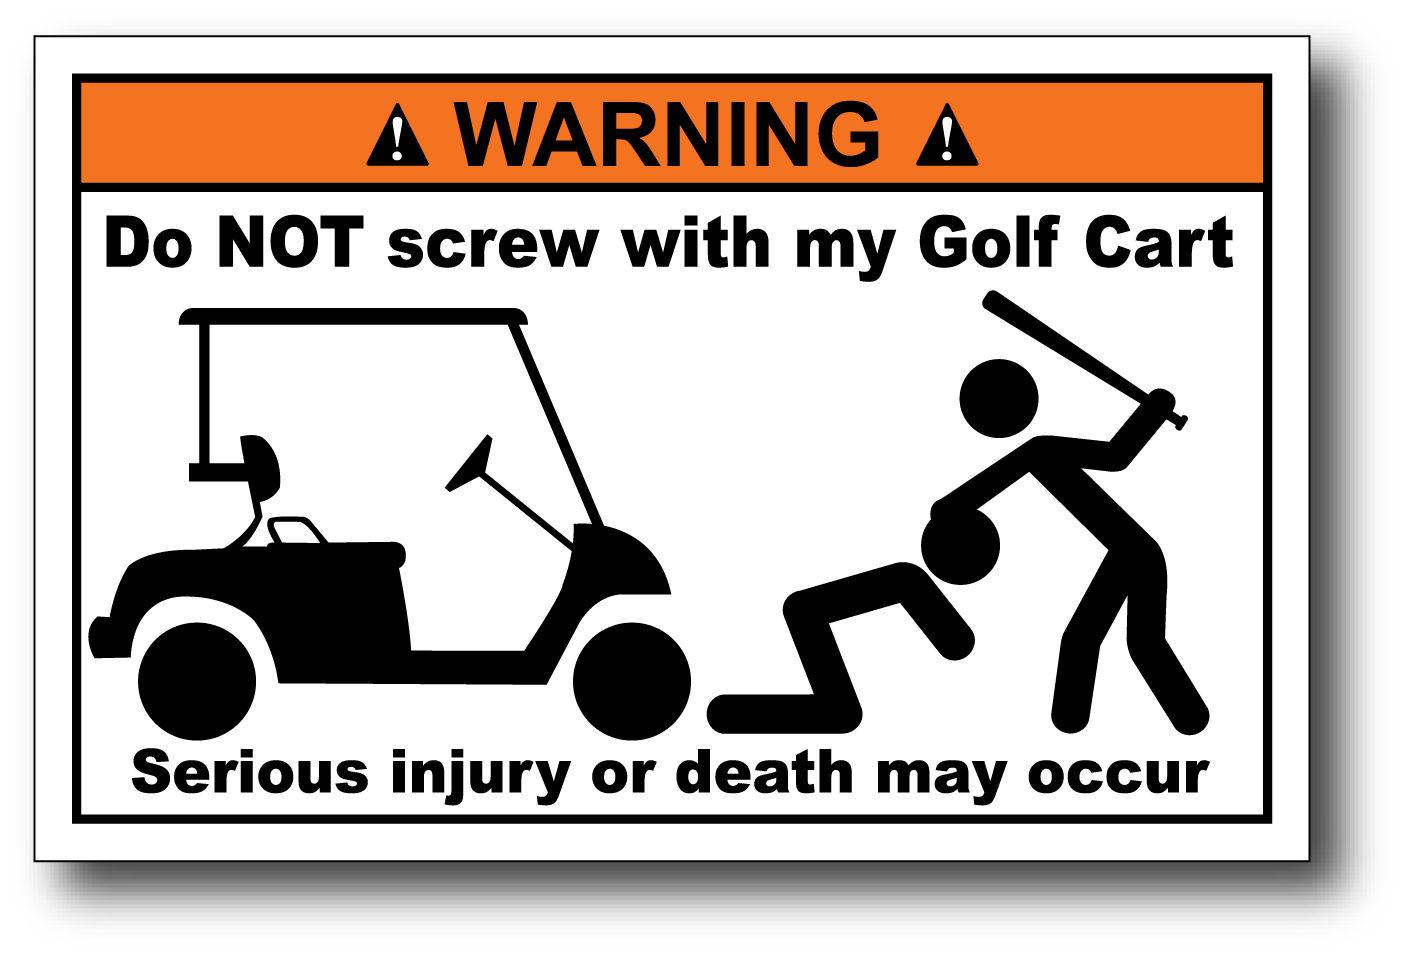 2 99 Golf Cart Do Not Screw Funny Warning Decal Sticker Car Graphics Club Team Hard Ebay Collectibles Golf Carts Car Graphics Car Stickers